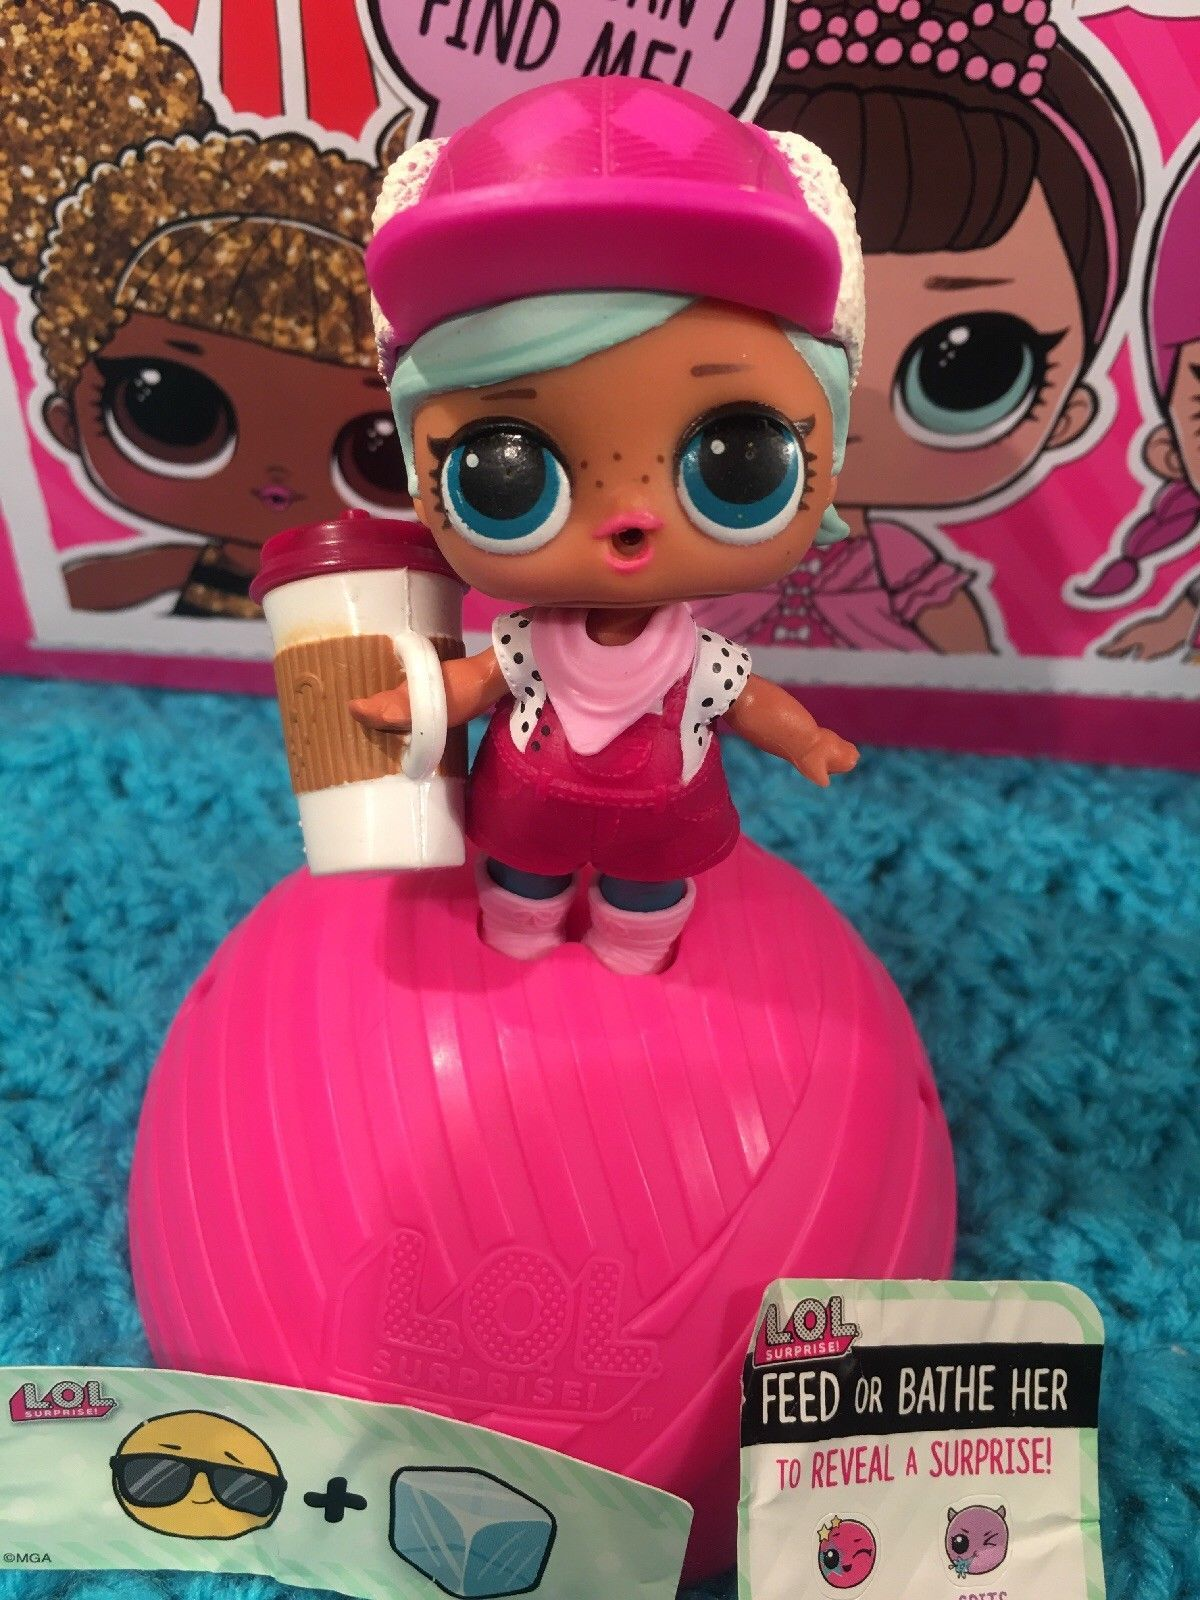 RARE HTF LOL Surprise Doll Retired Series 2 Brr Baby